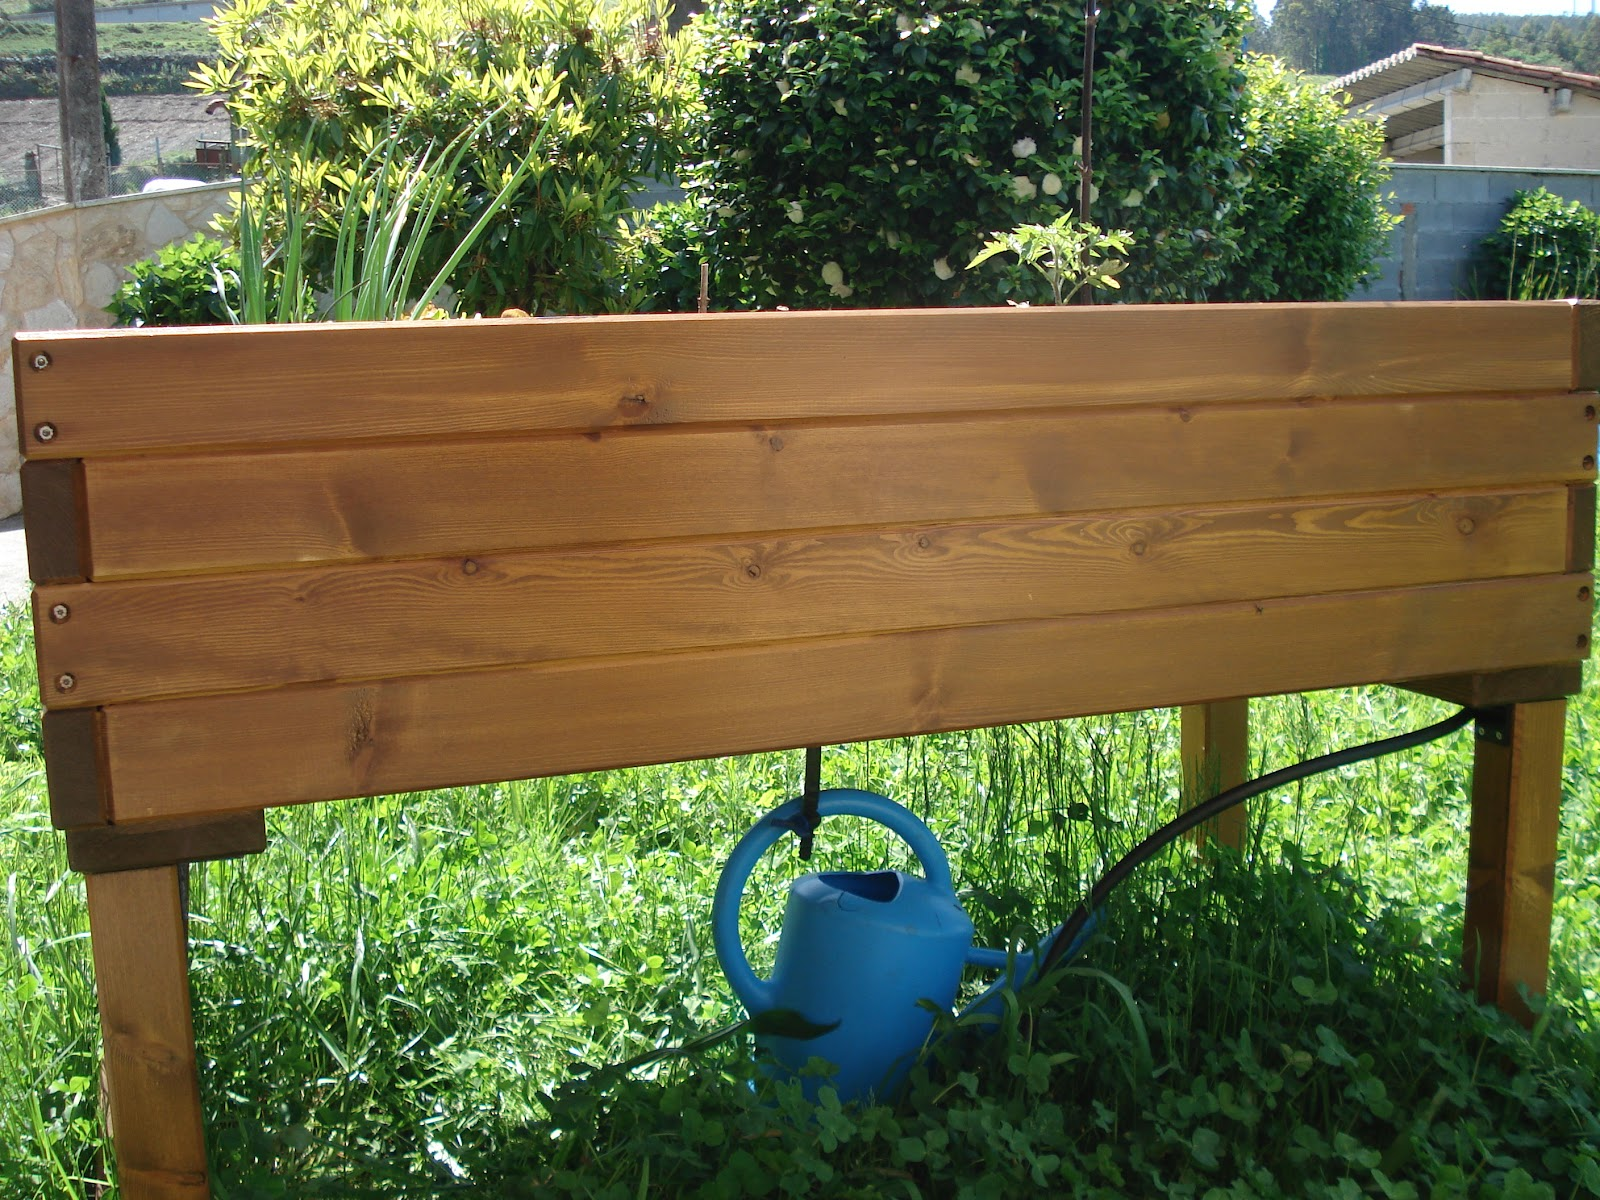 Madreselva jardiner a ecol gica madreselva xardiner a ecol xica nuestra mesa de cultivo - Drenaje mesa de cultivo ...